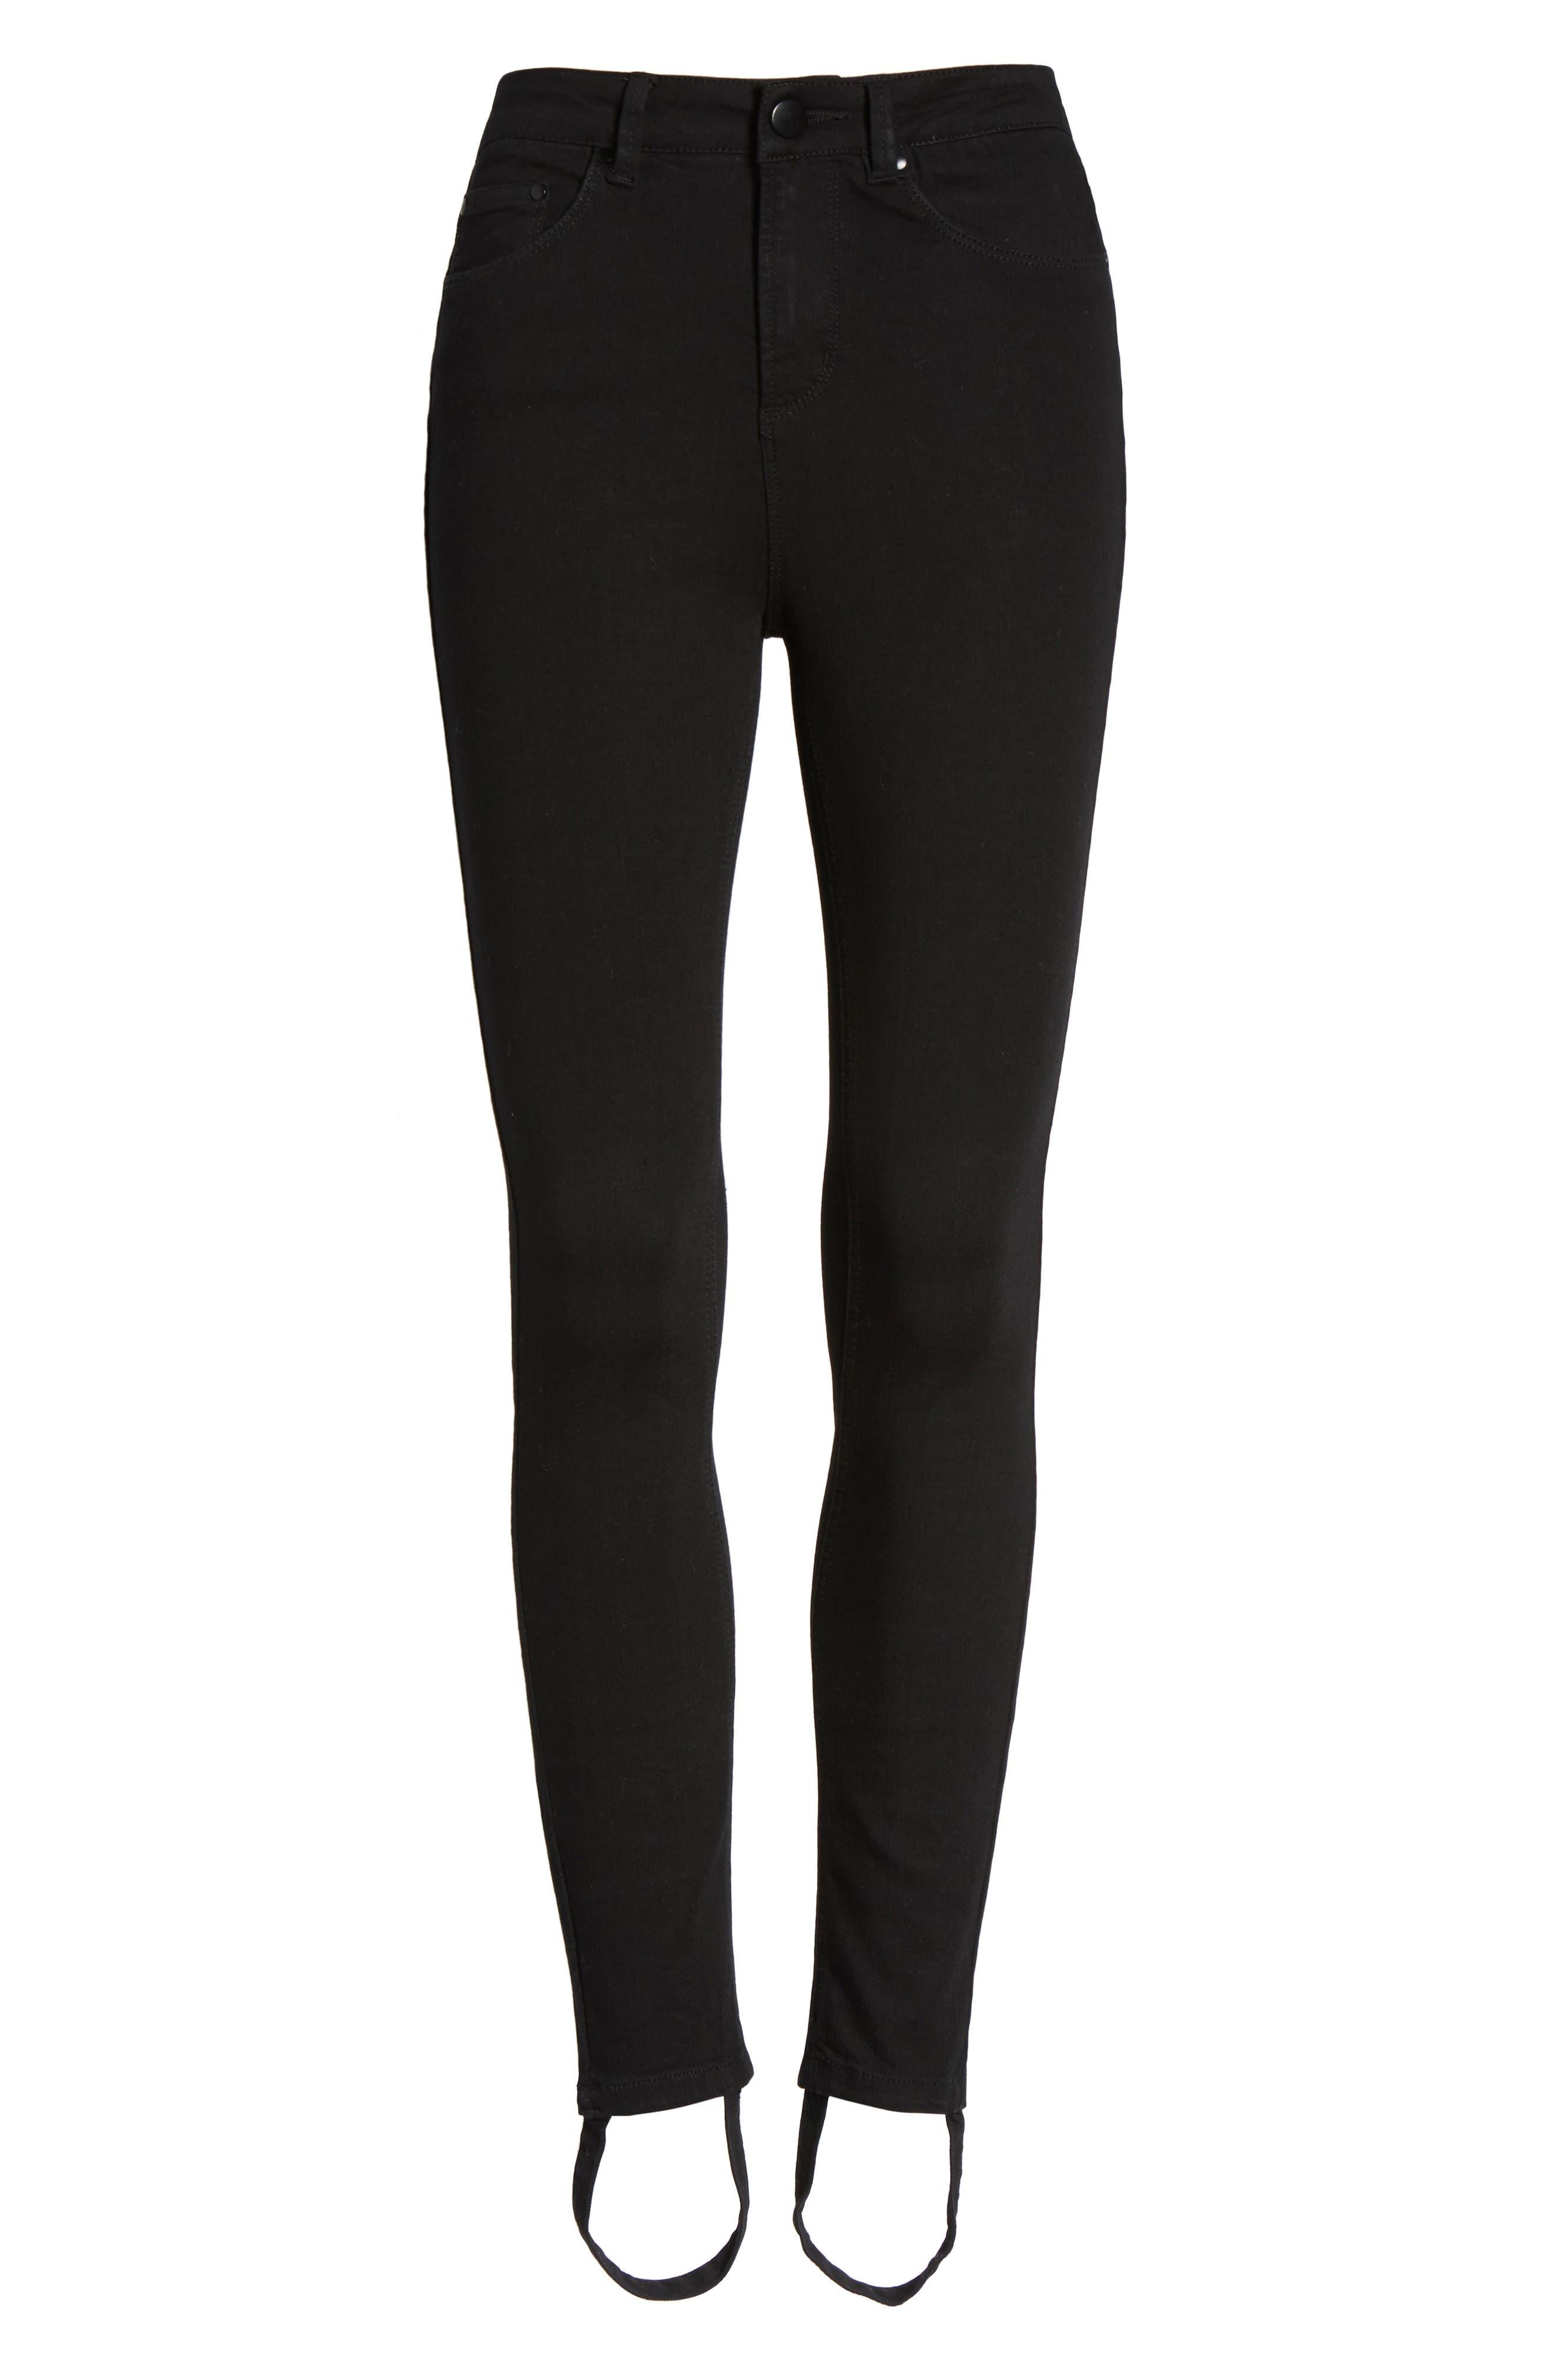 Luma High Waist Skinny Stirrup Jeans,                             Alternate thumbnail 6, color,                             002